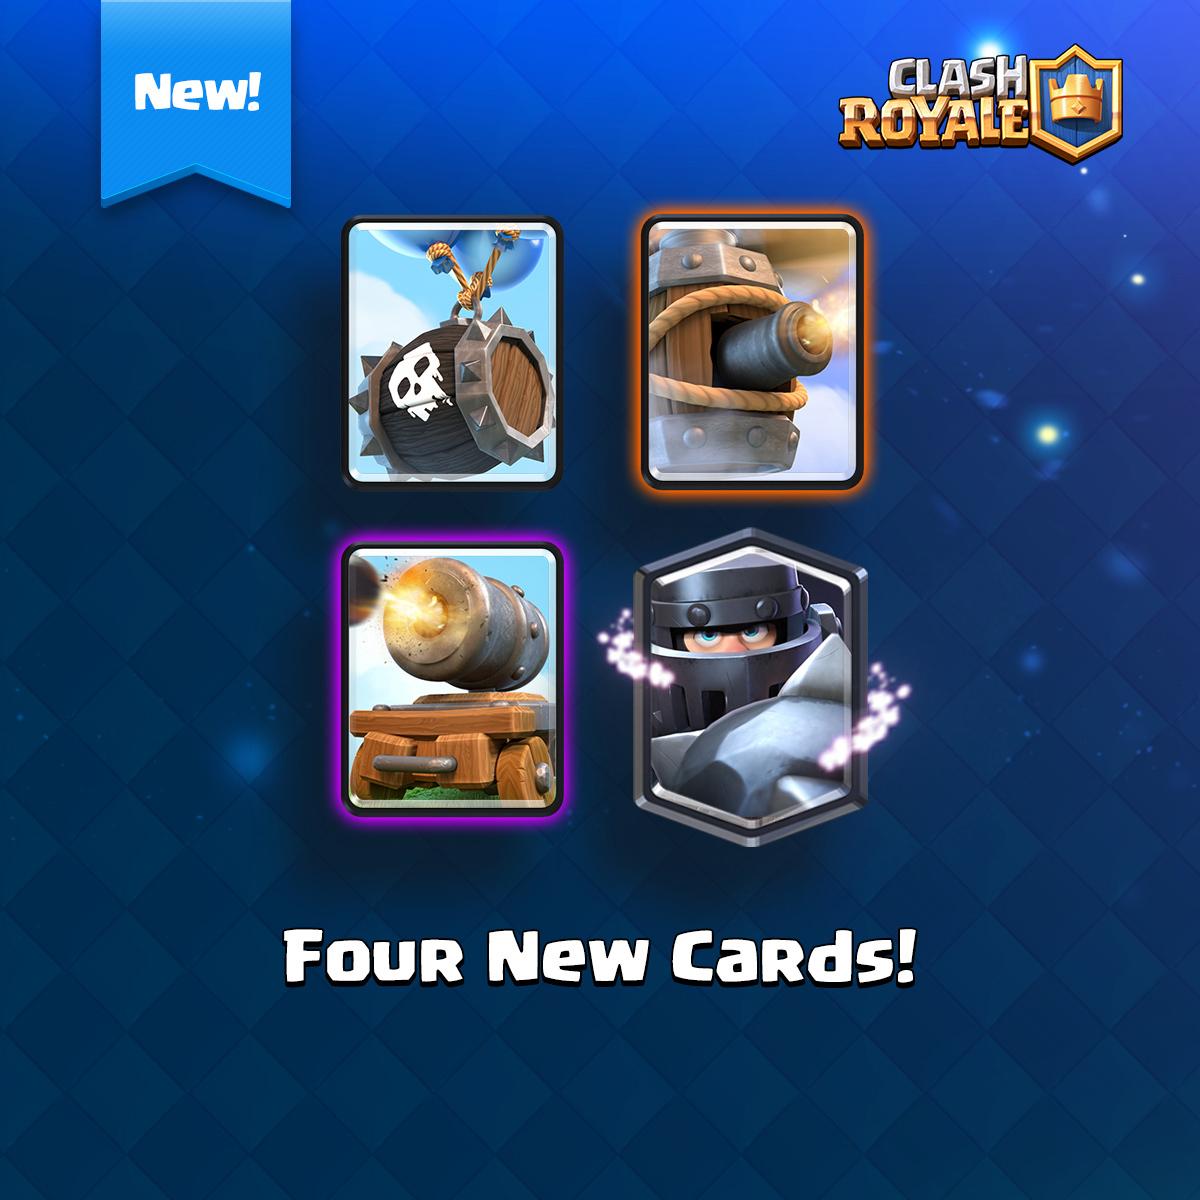 SNEAK PEEK #2 – Four New Cards!